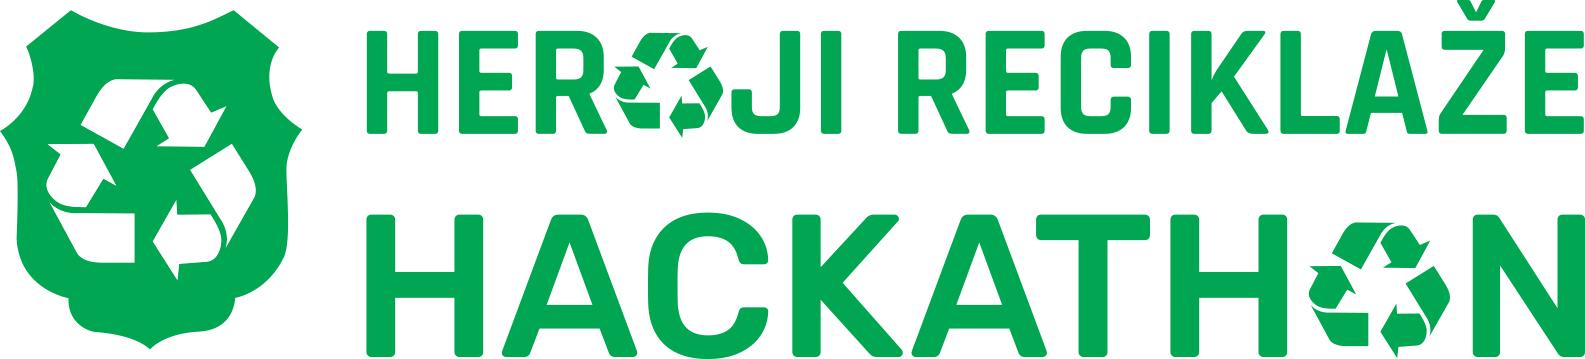 Heroji reciklaže – Hackathon